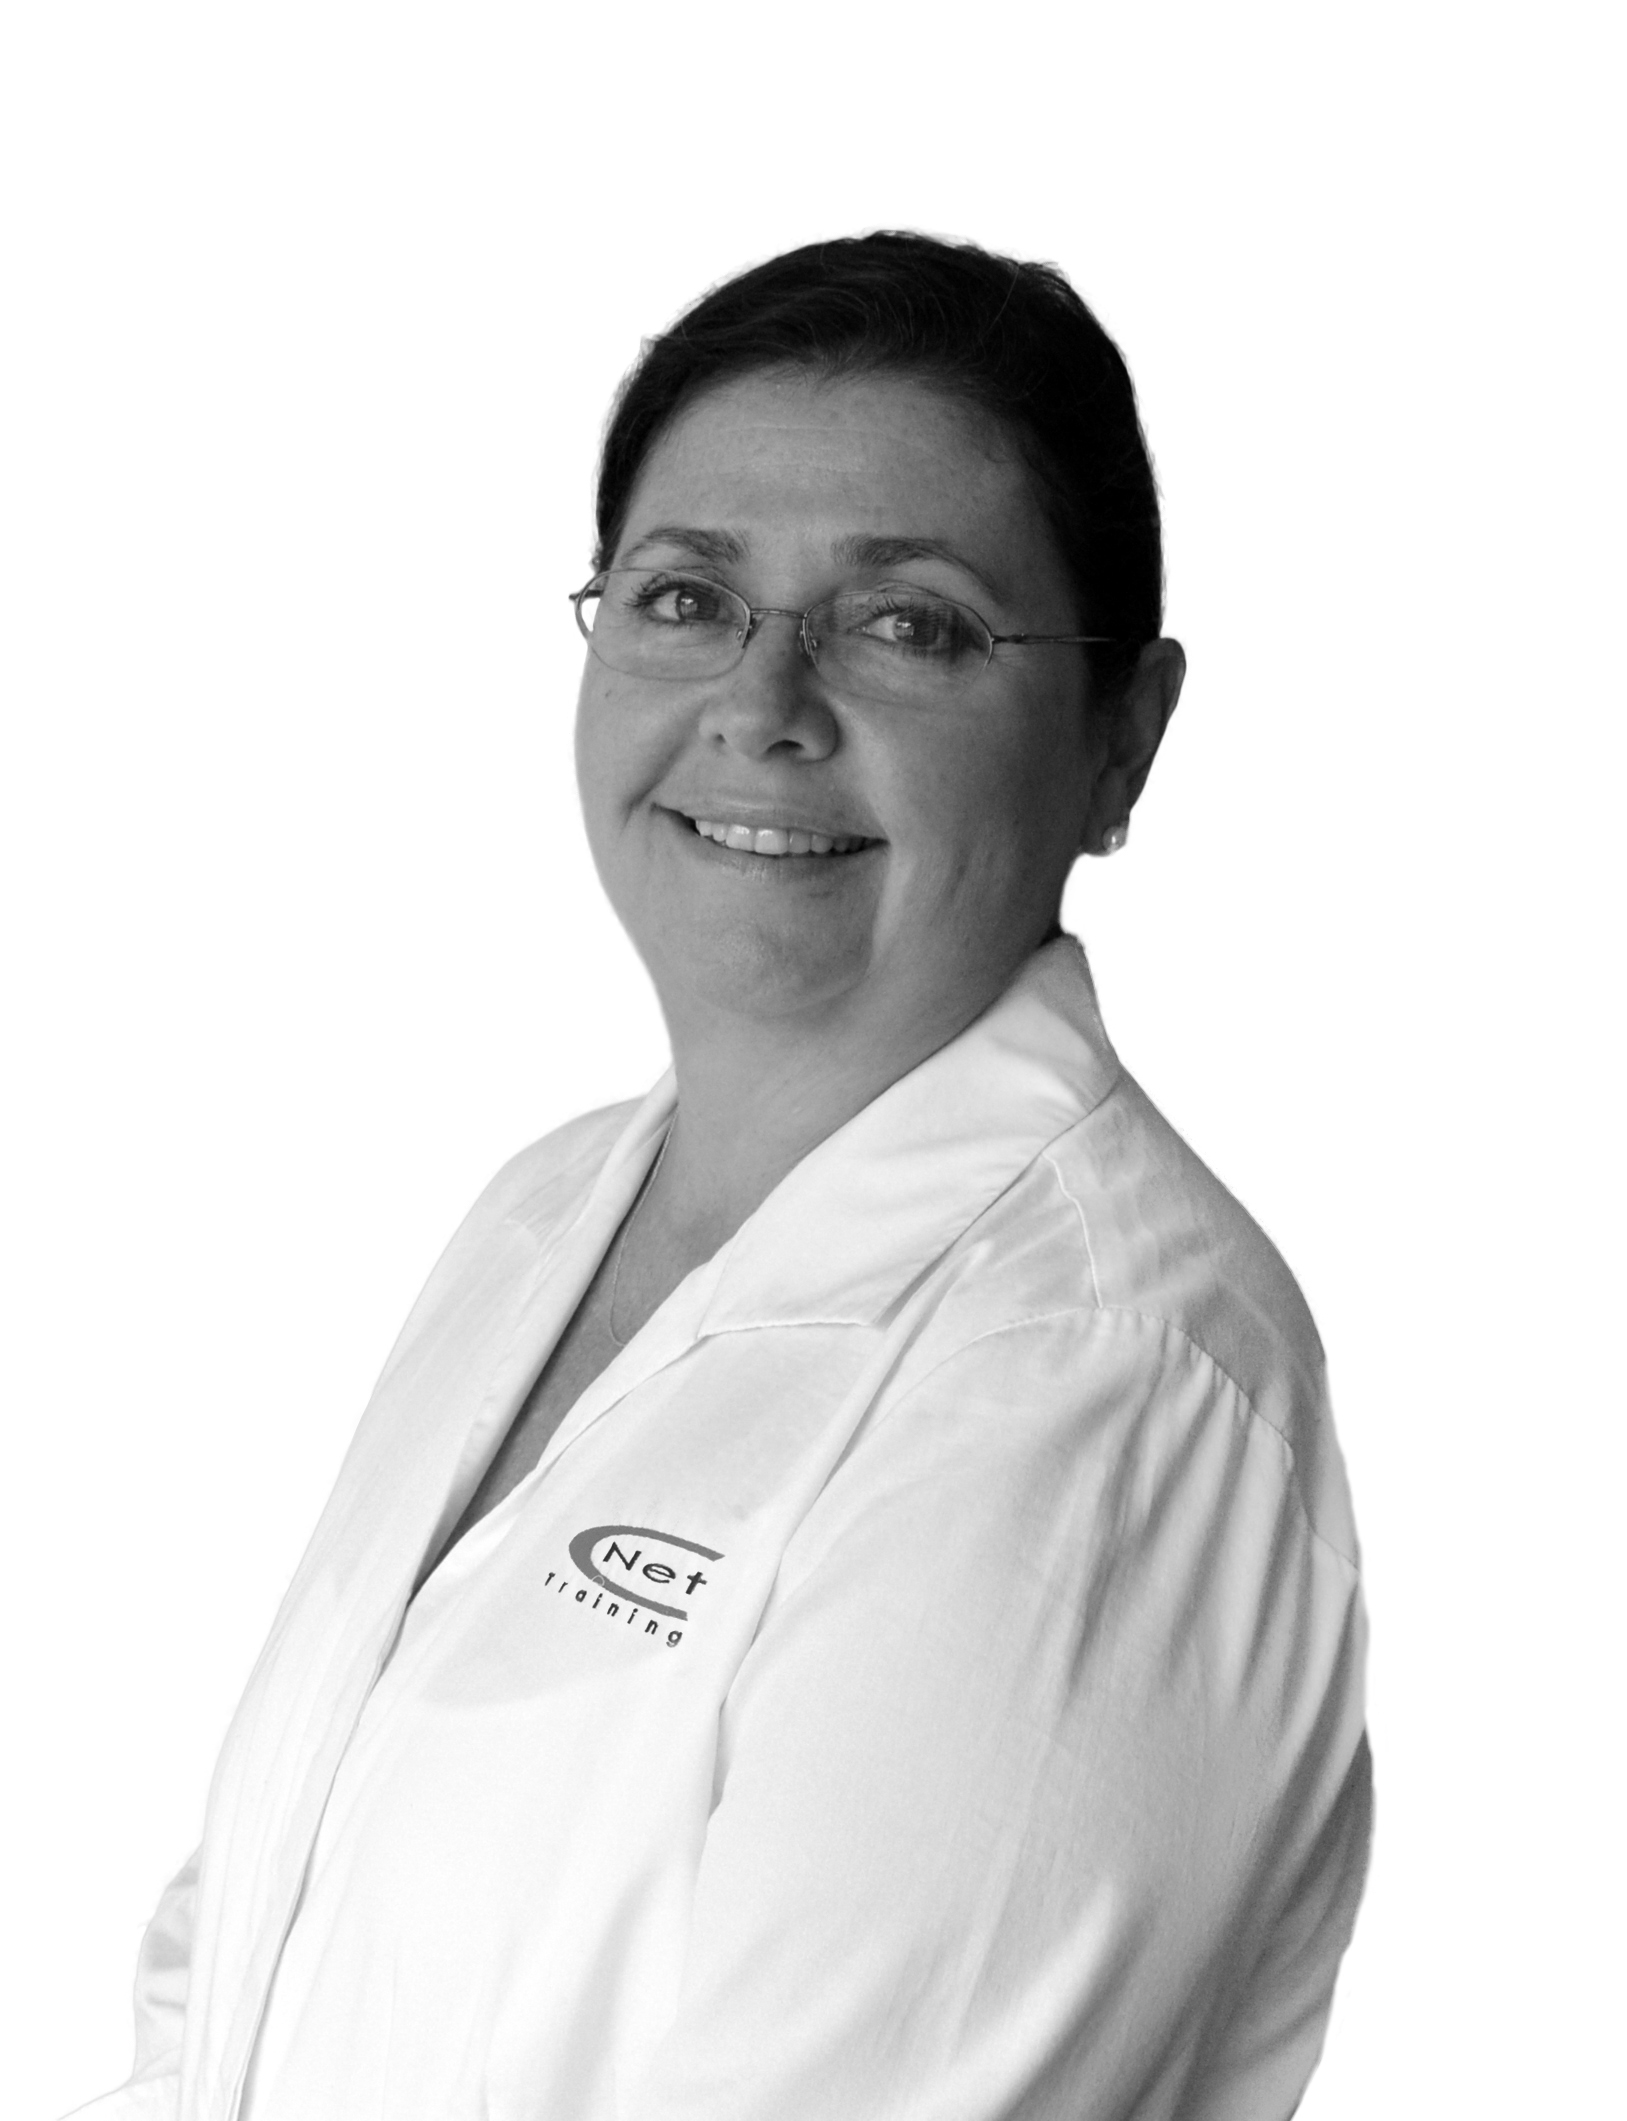 Melissa Chambal Instructor at CNet Training